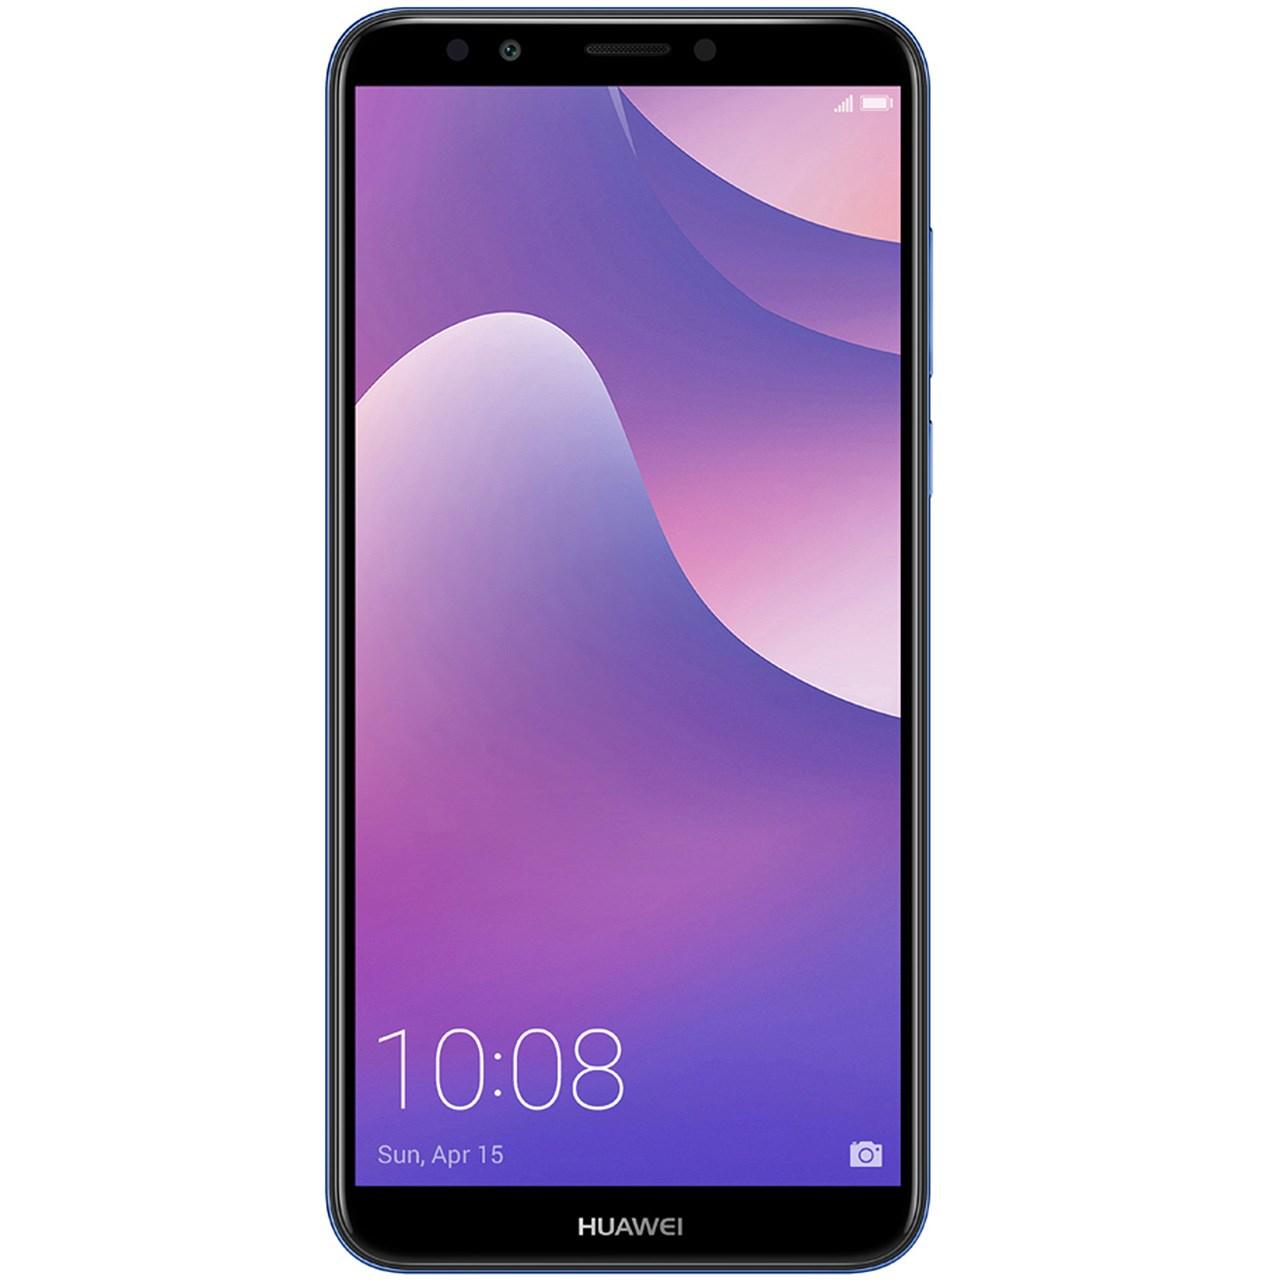 "<span style="""">گوشی موبایل هوآوی مدل Y7 Prime 2018 دو سیم کارت – با برچسب قیمت مصرفکننده                             Huawei Y7 Prime 2018 Dual SIM Mobile Phone</span>"